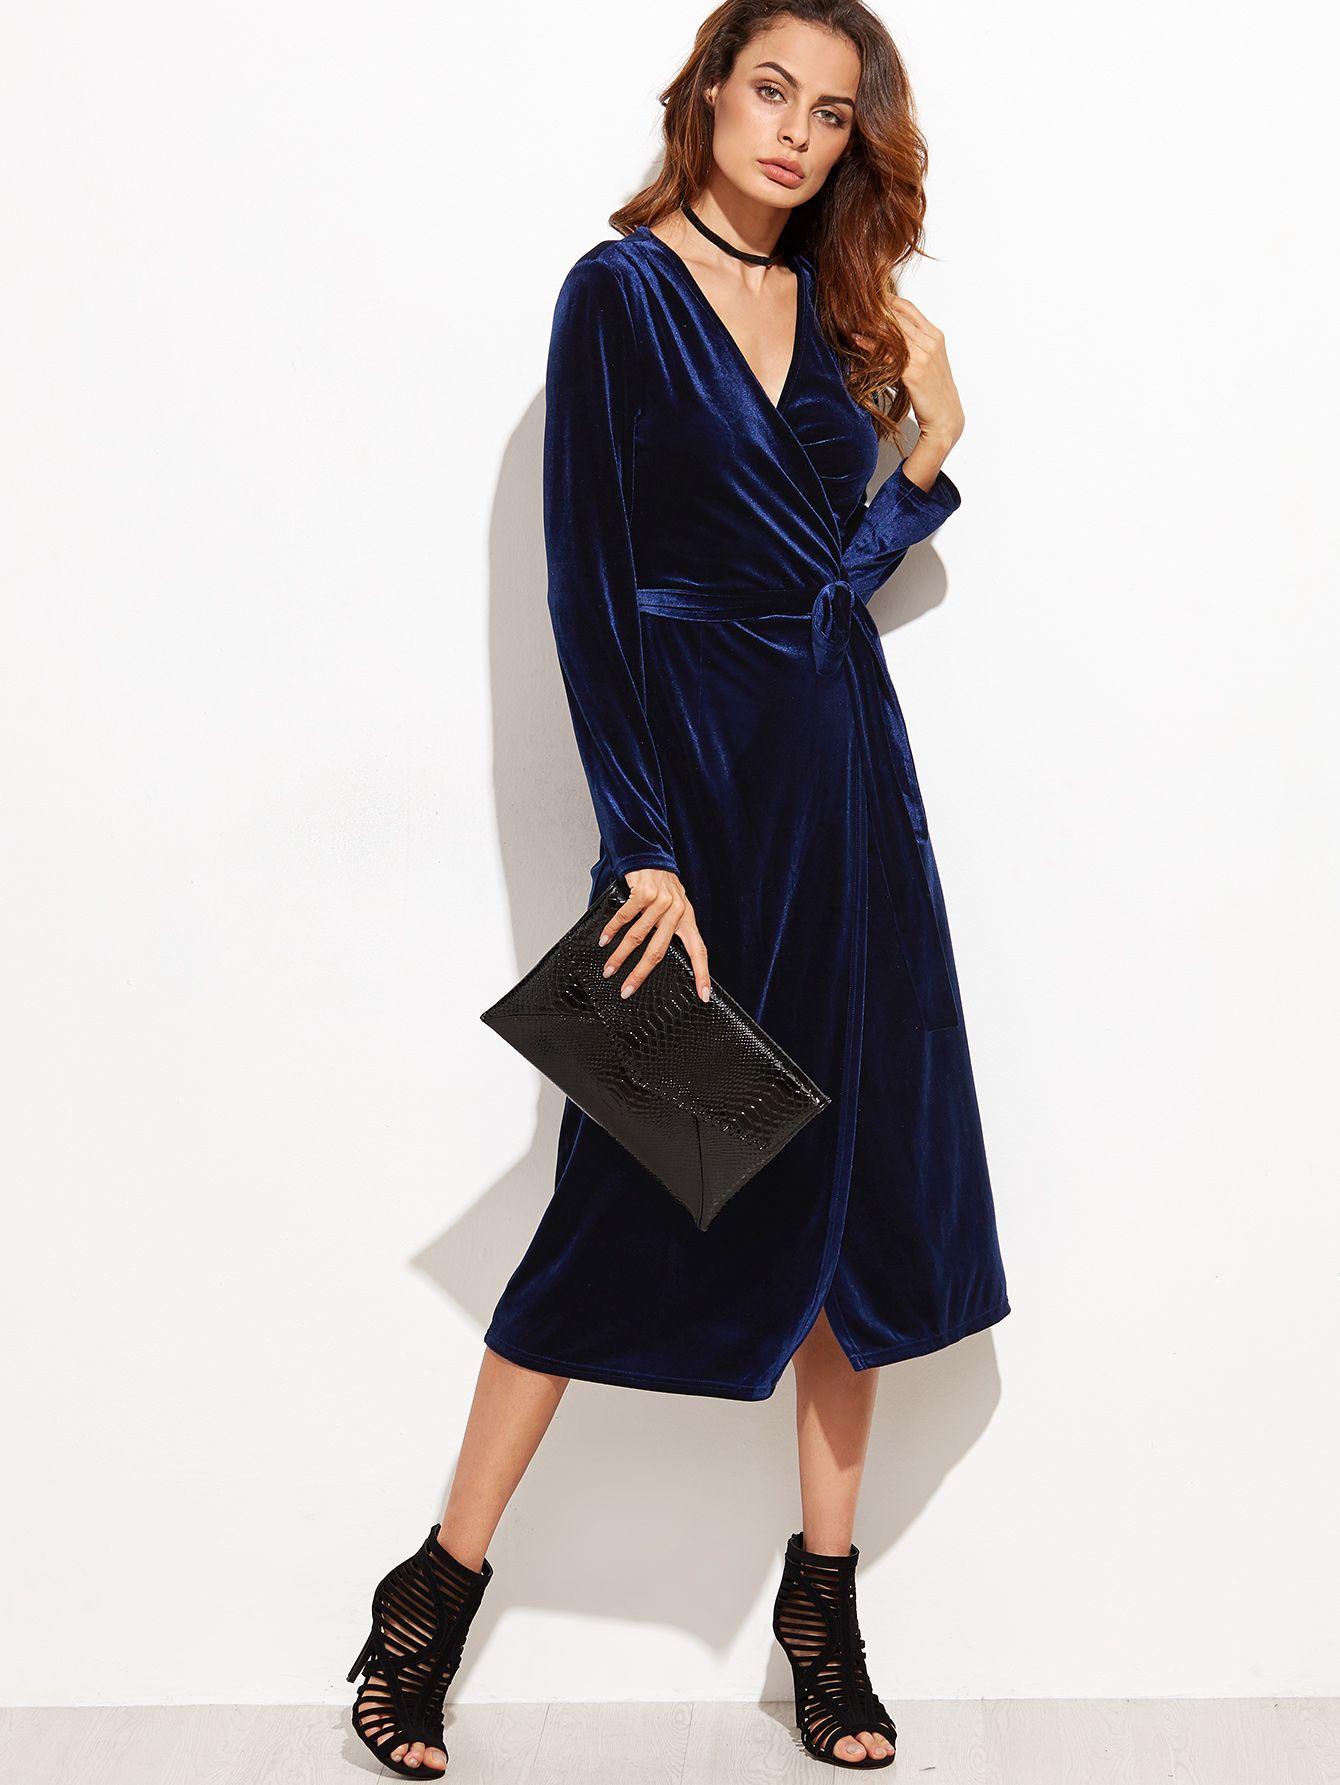 Shop navy surplice front velvet wrap dress online shein offers navy surplice front velvet wrap - Shein damenmode ...